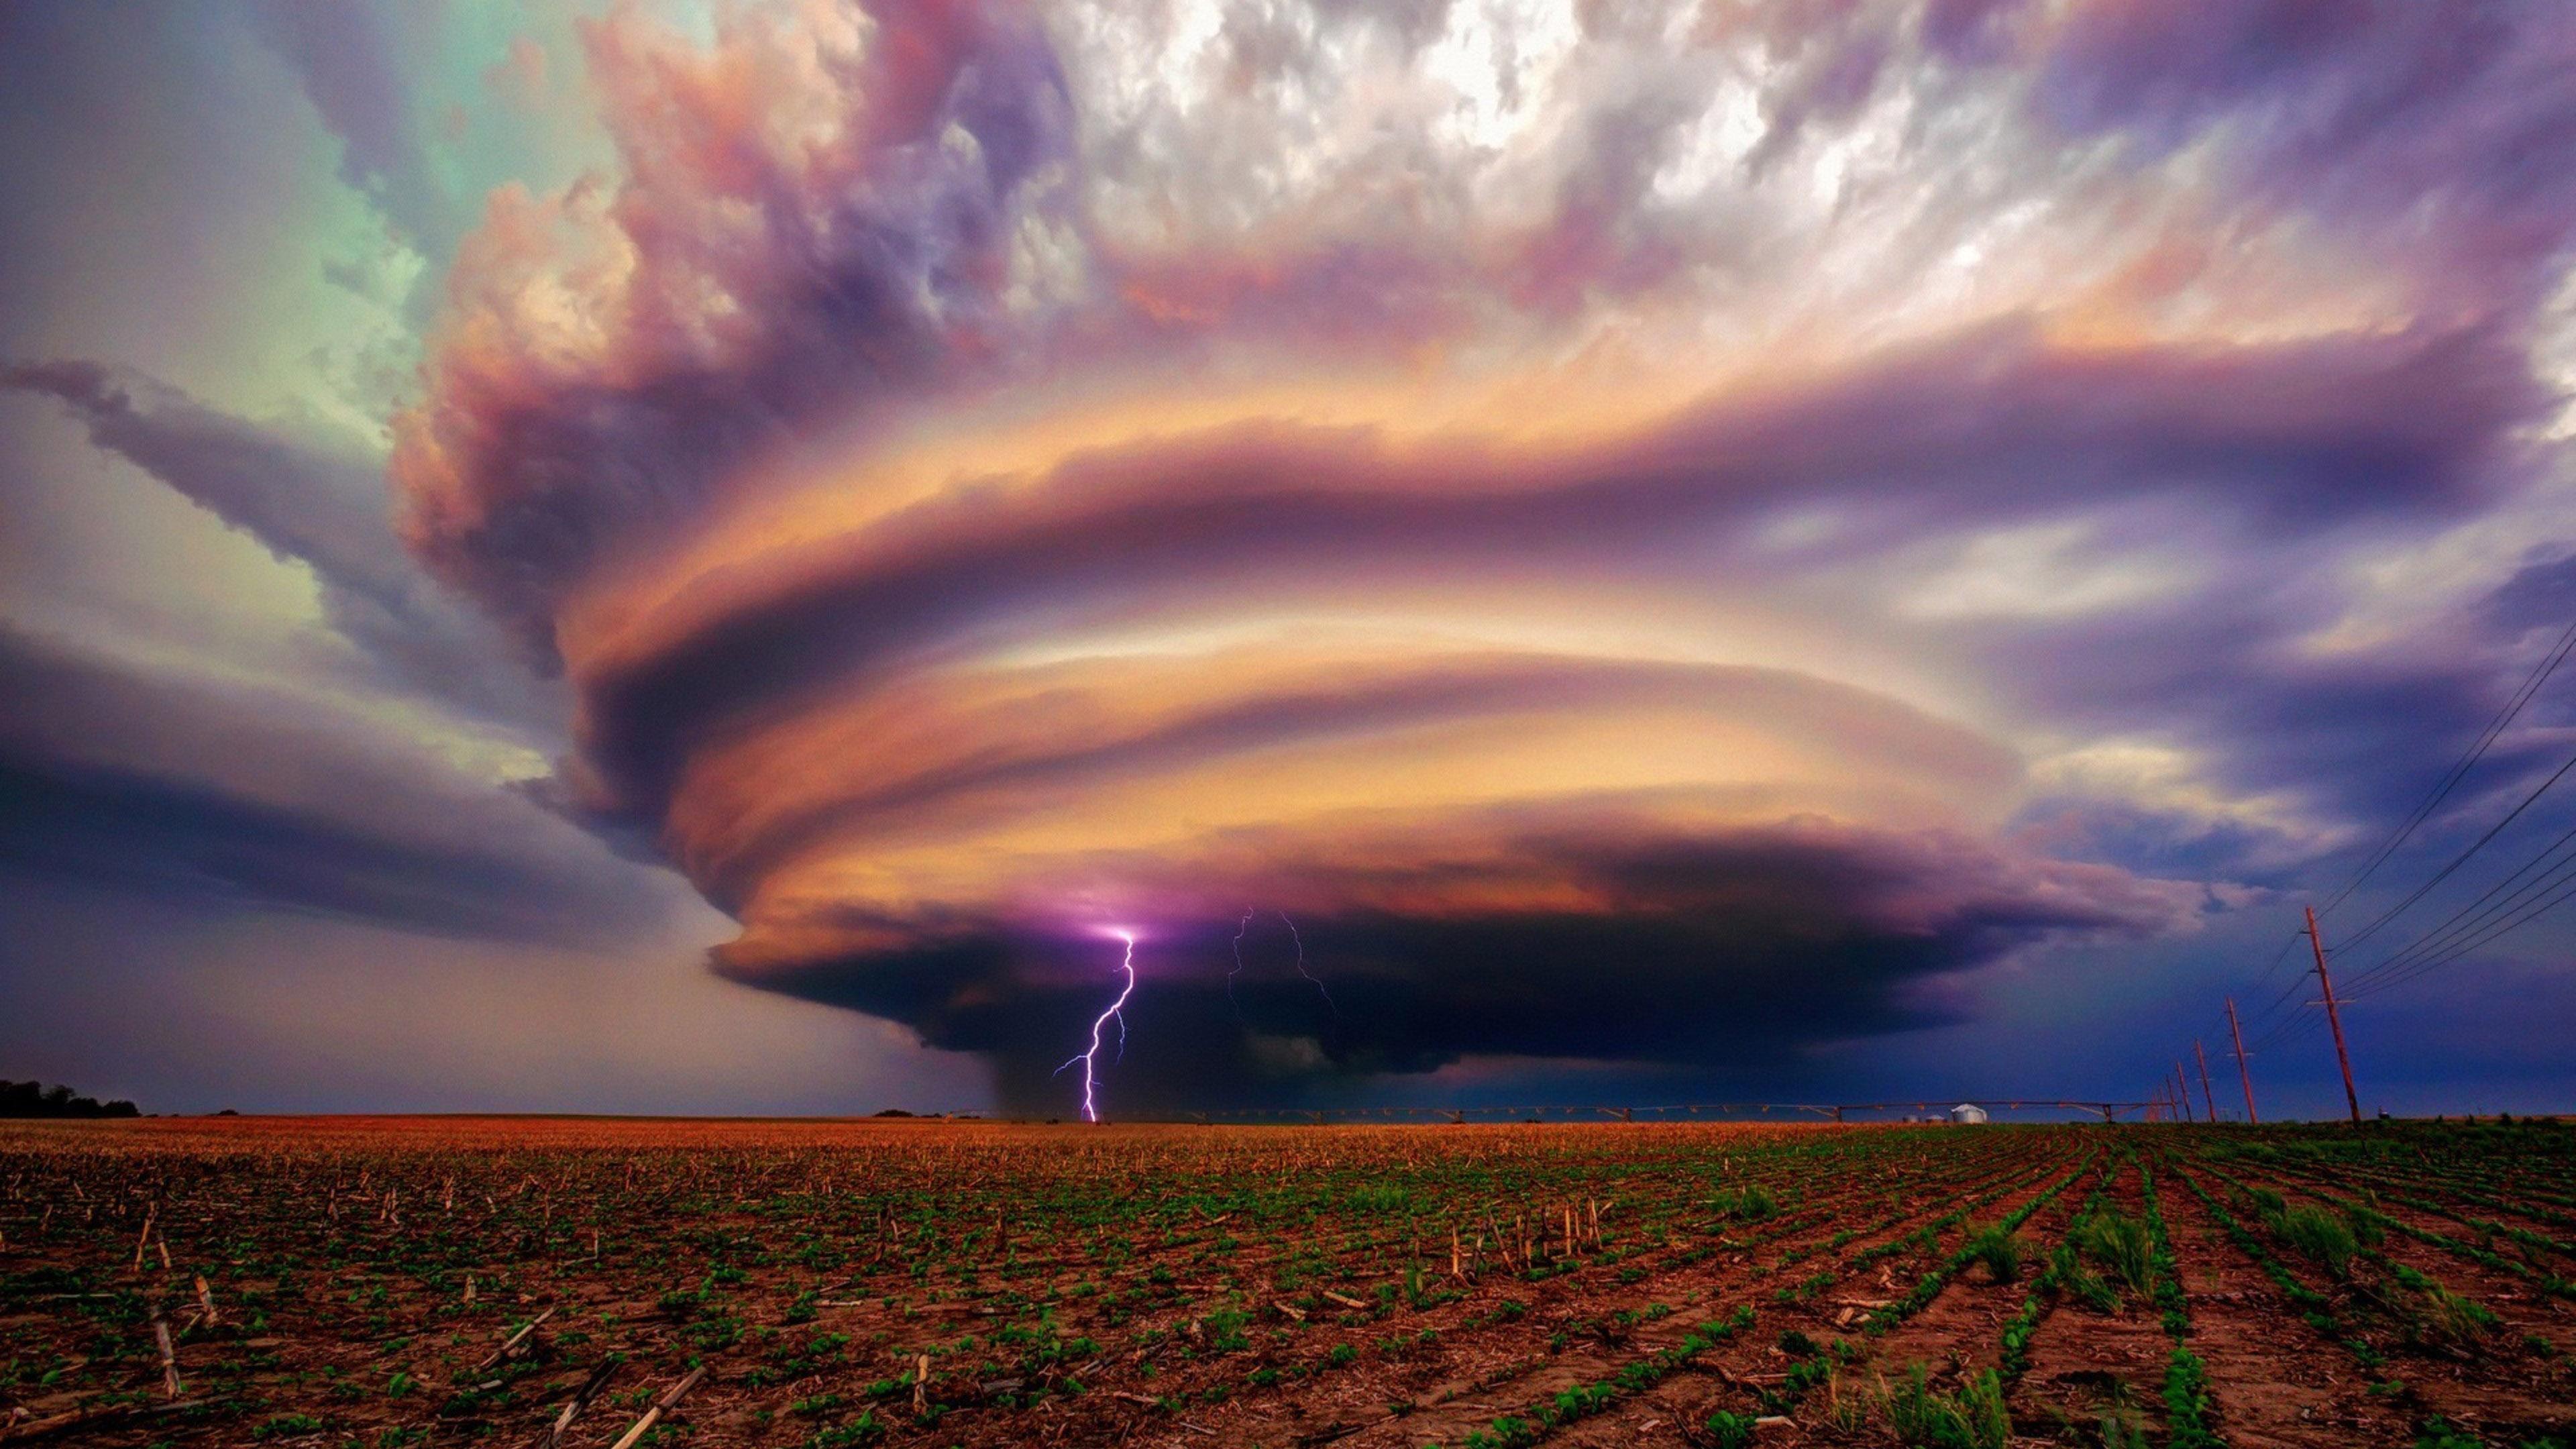 Huge Tornado Wallpaper 3840x2160